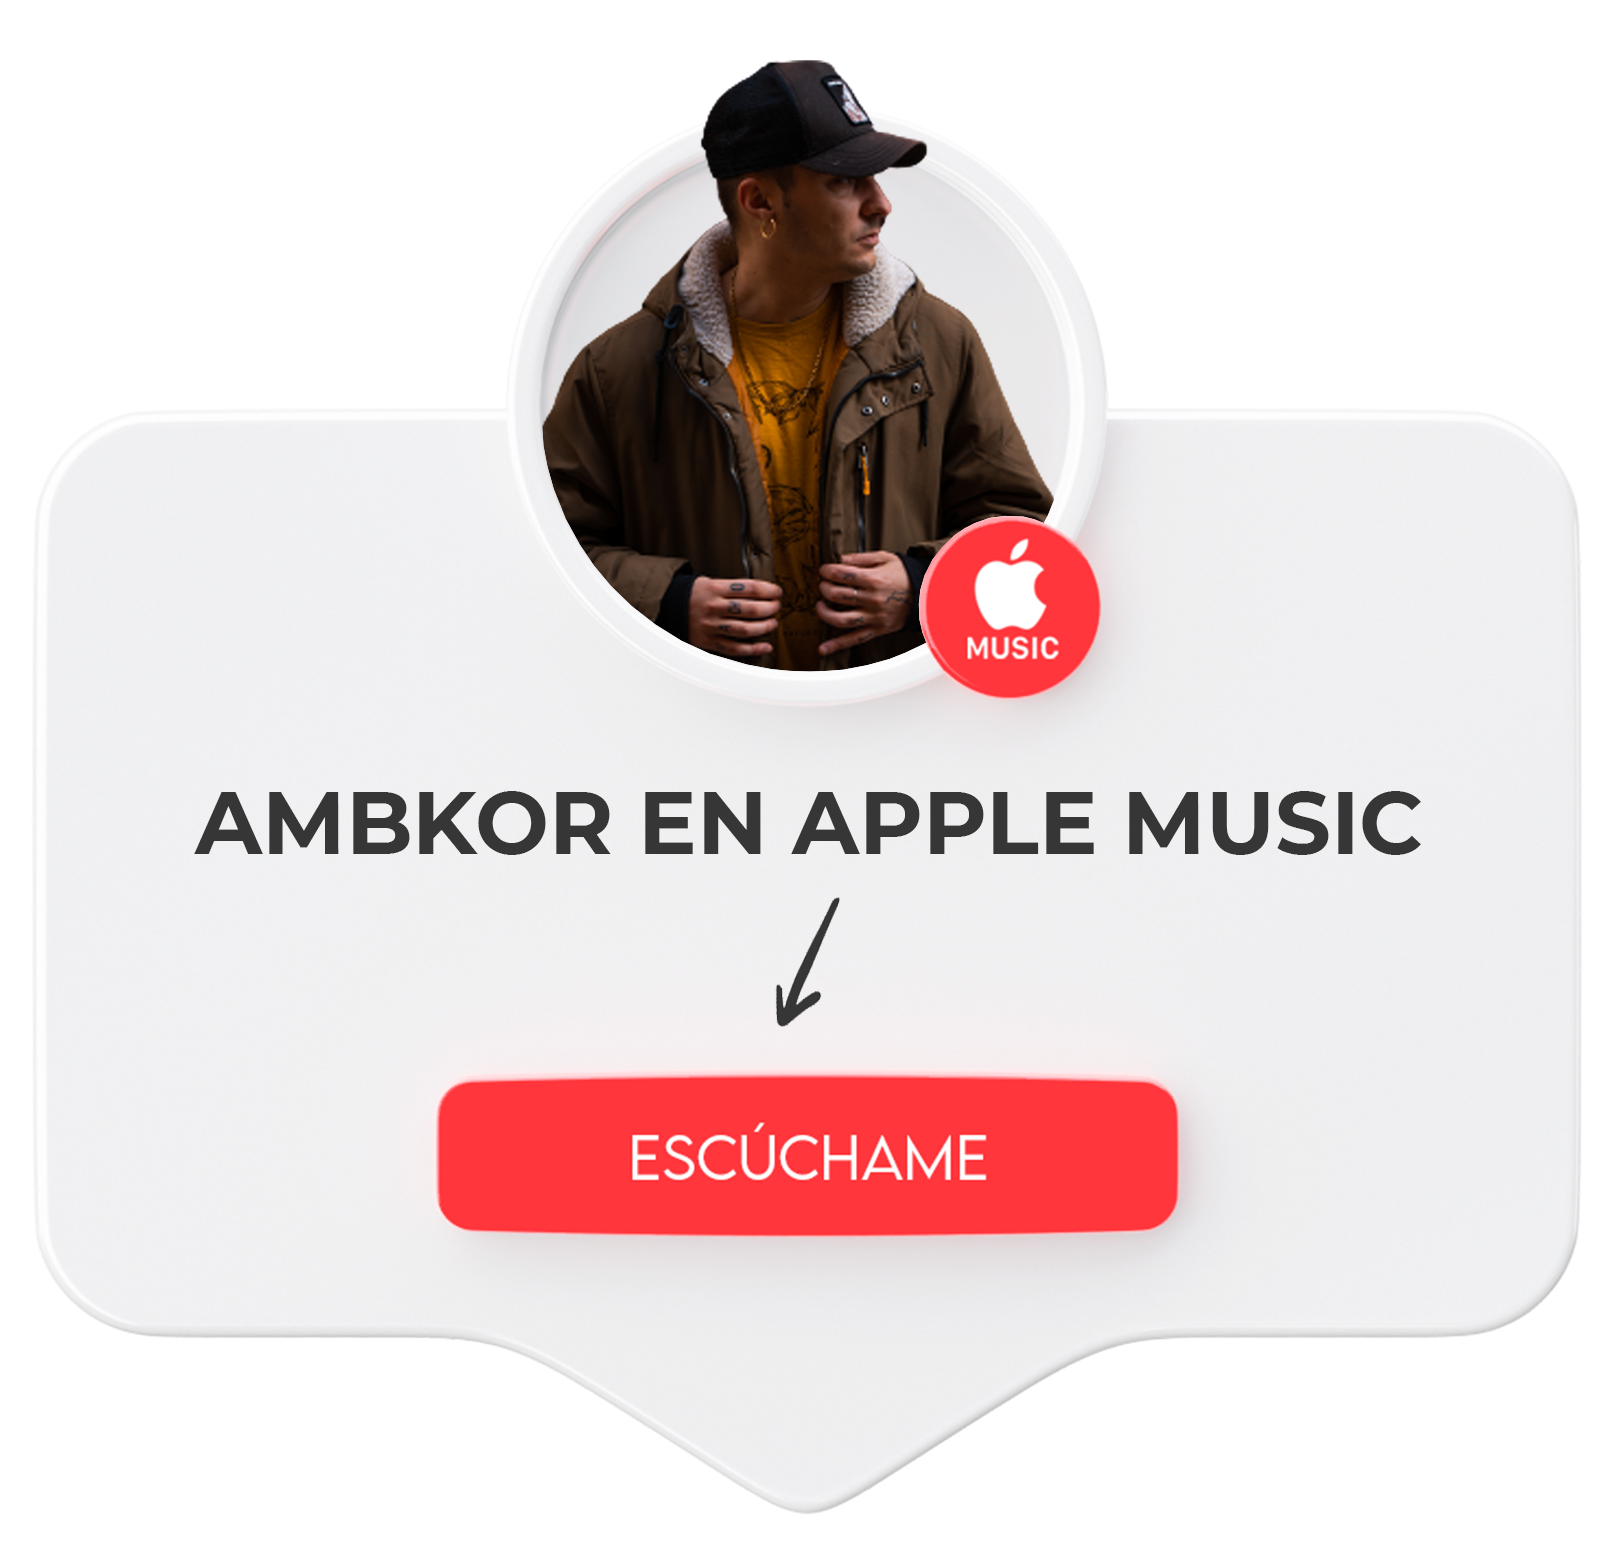 Ambkor en Apple Music